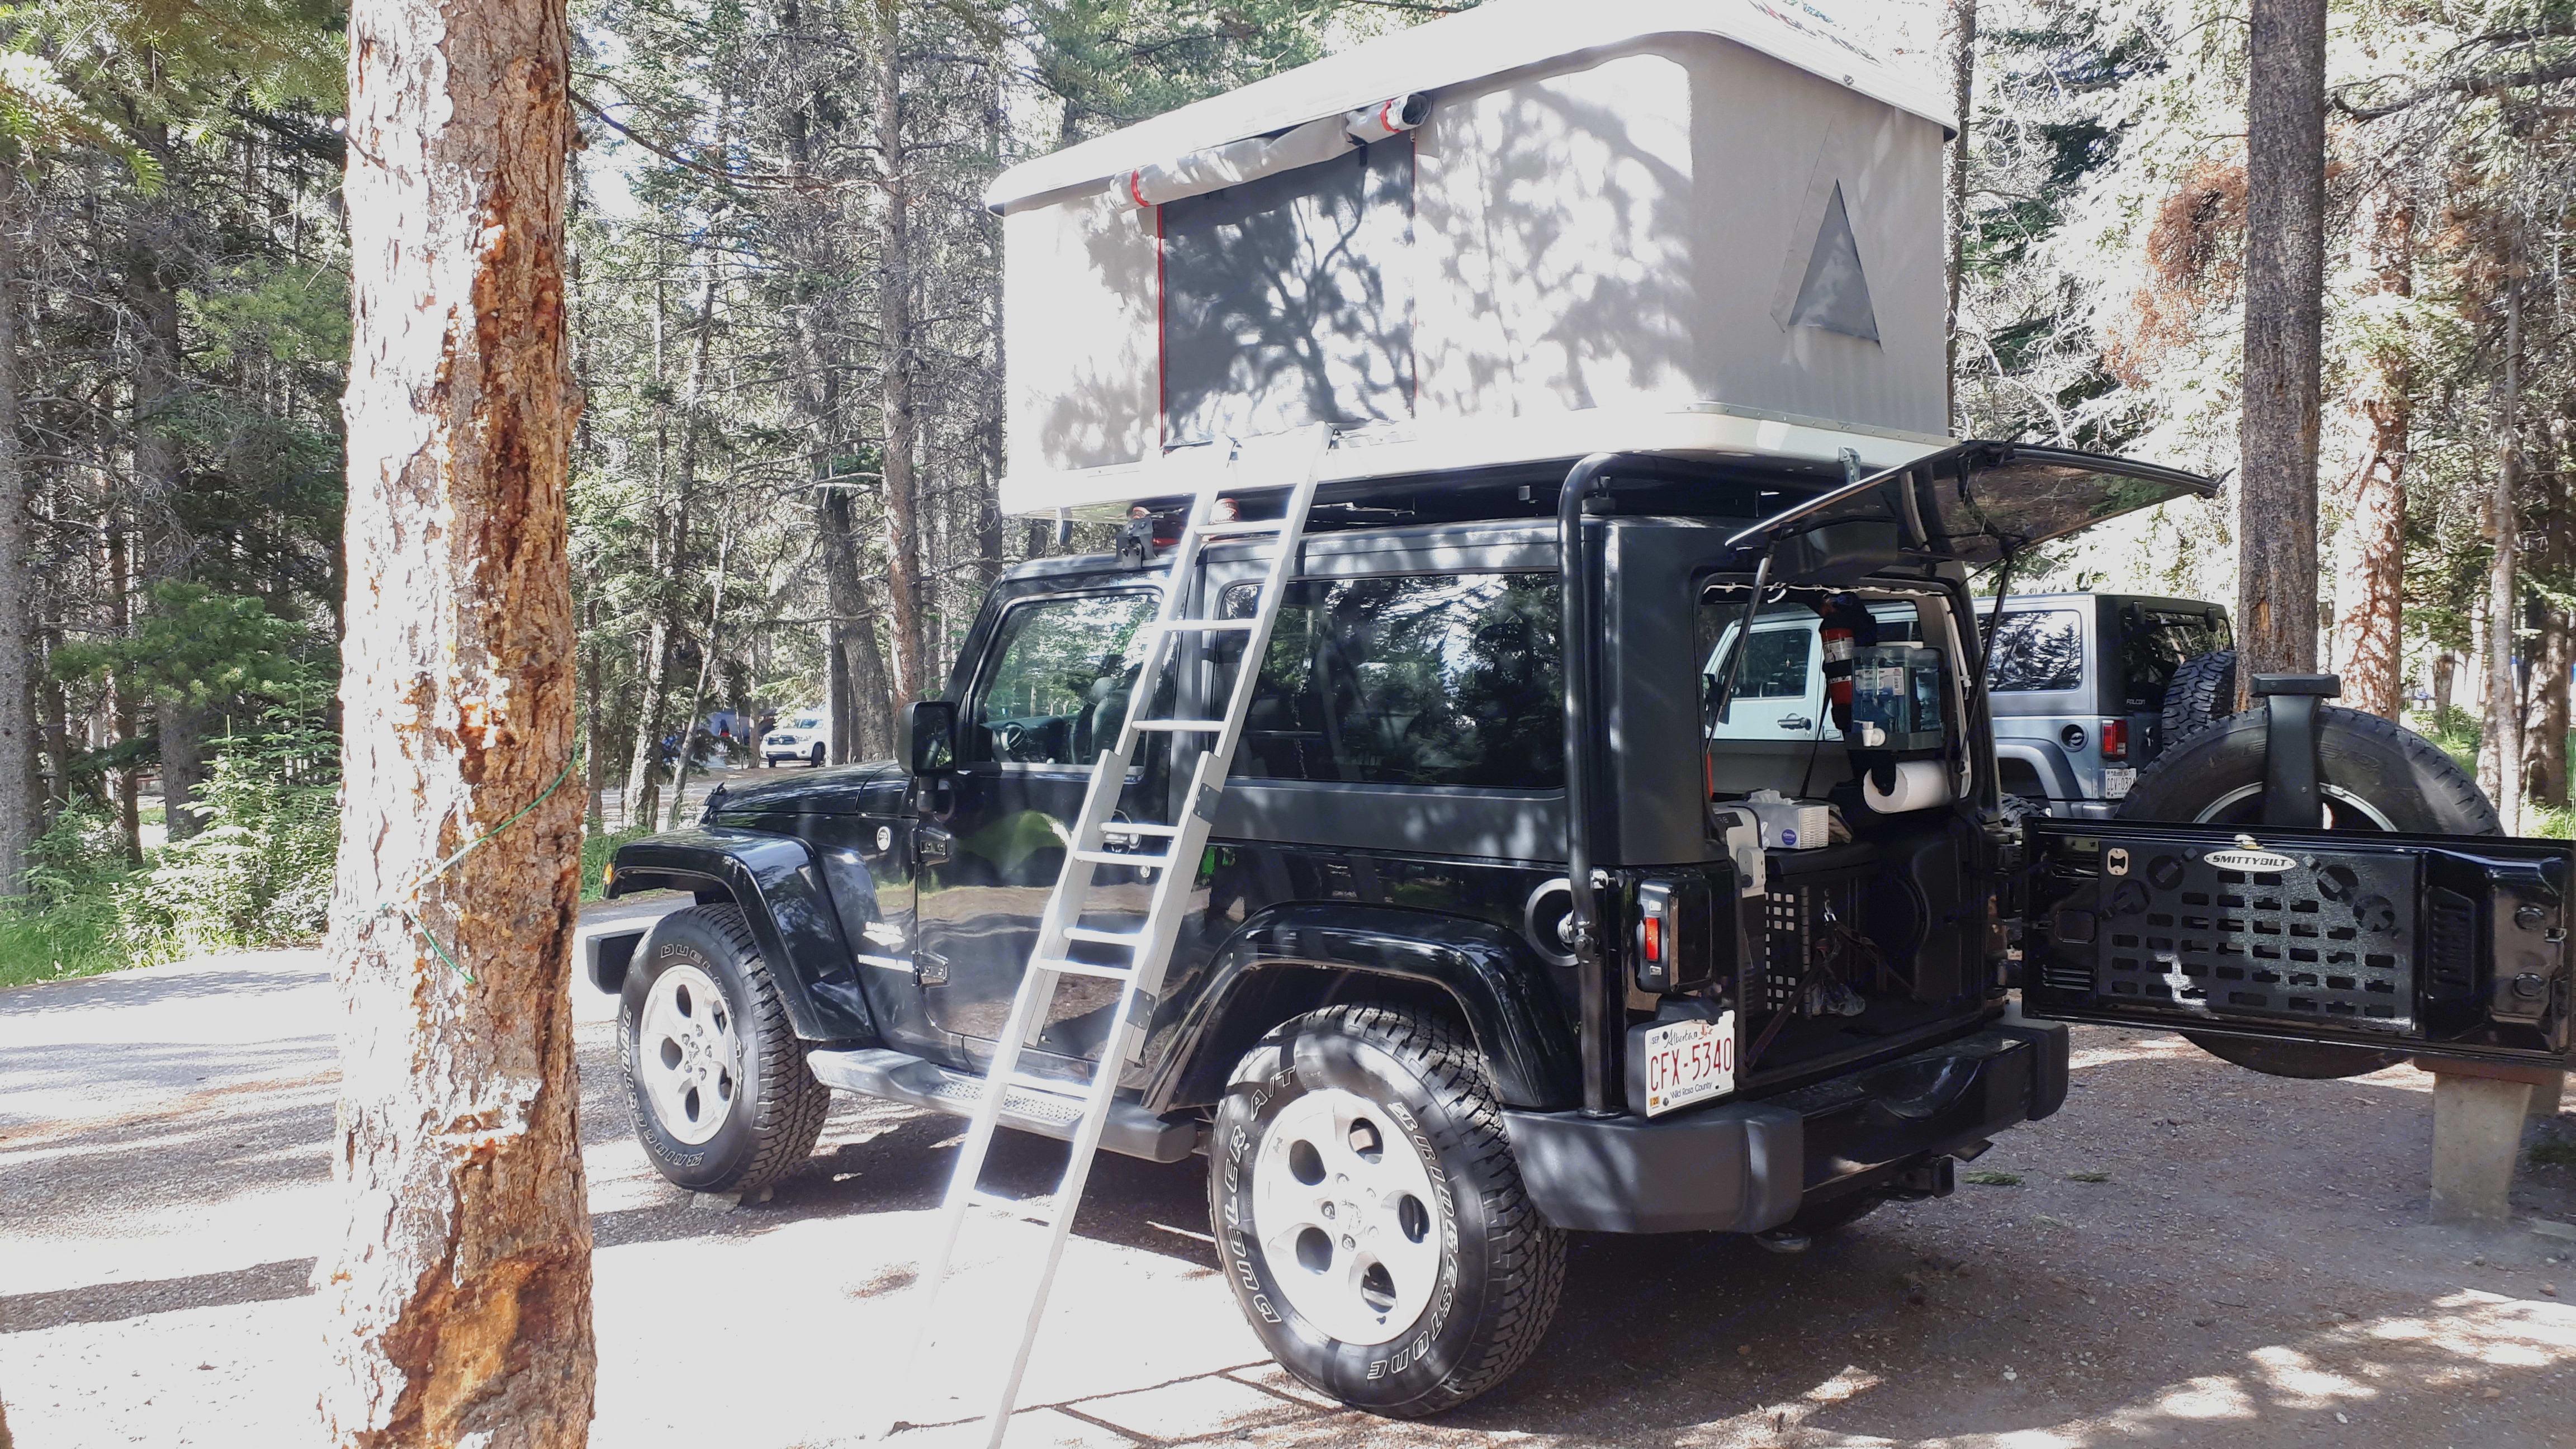 Jeep Wrangler JK 2013